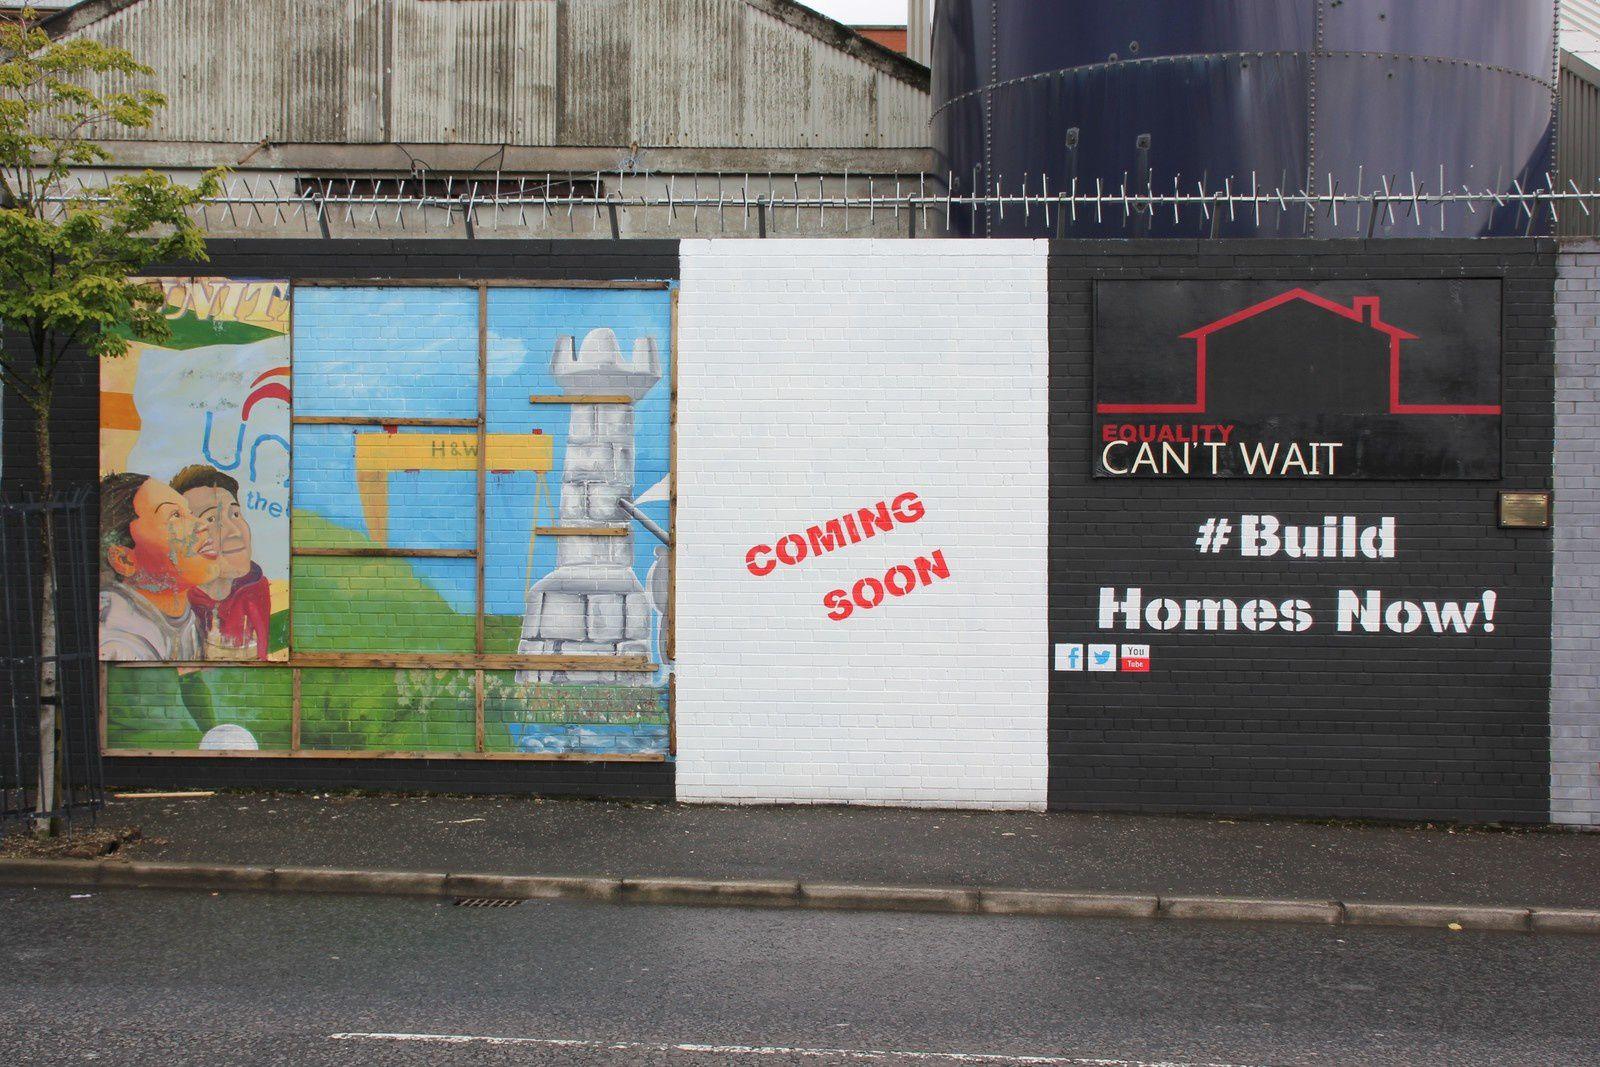 686) Northumberland Street, West Belfast